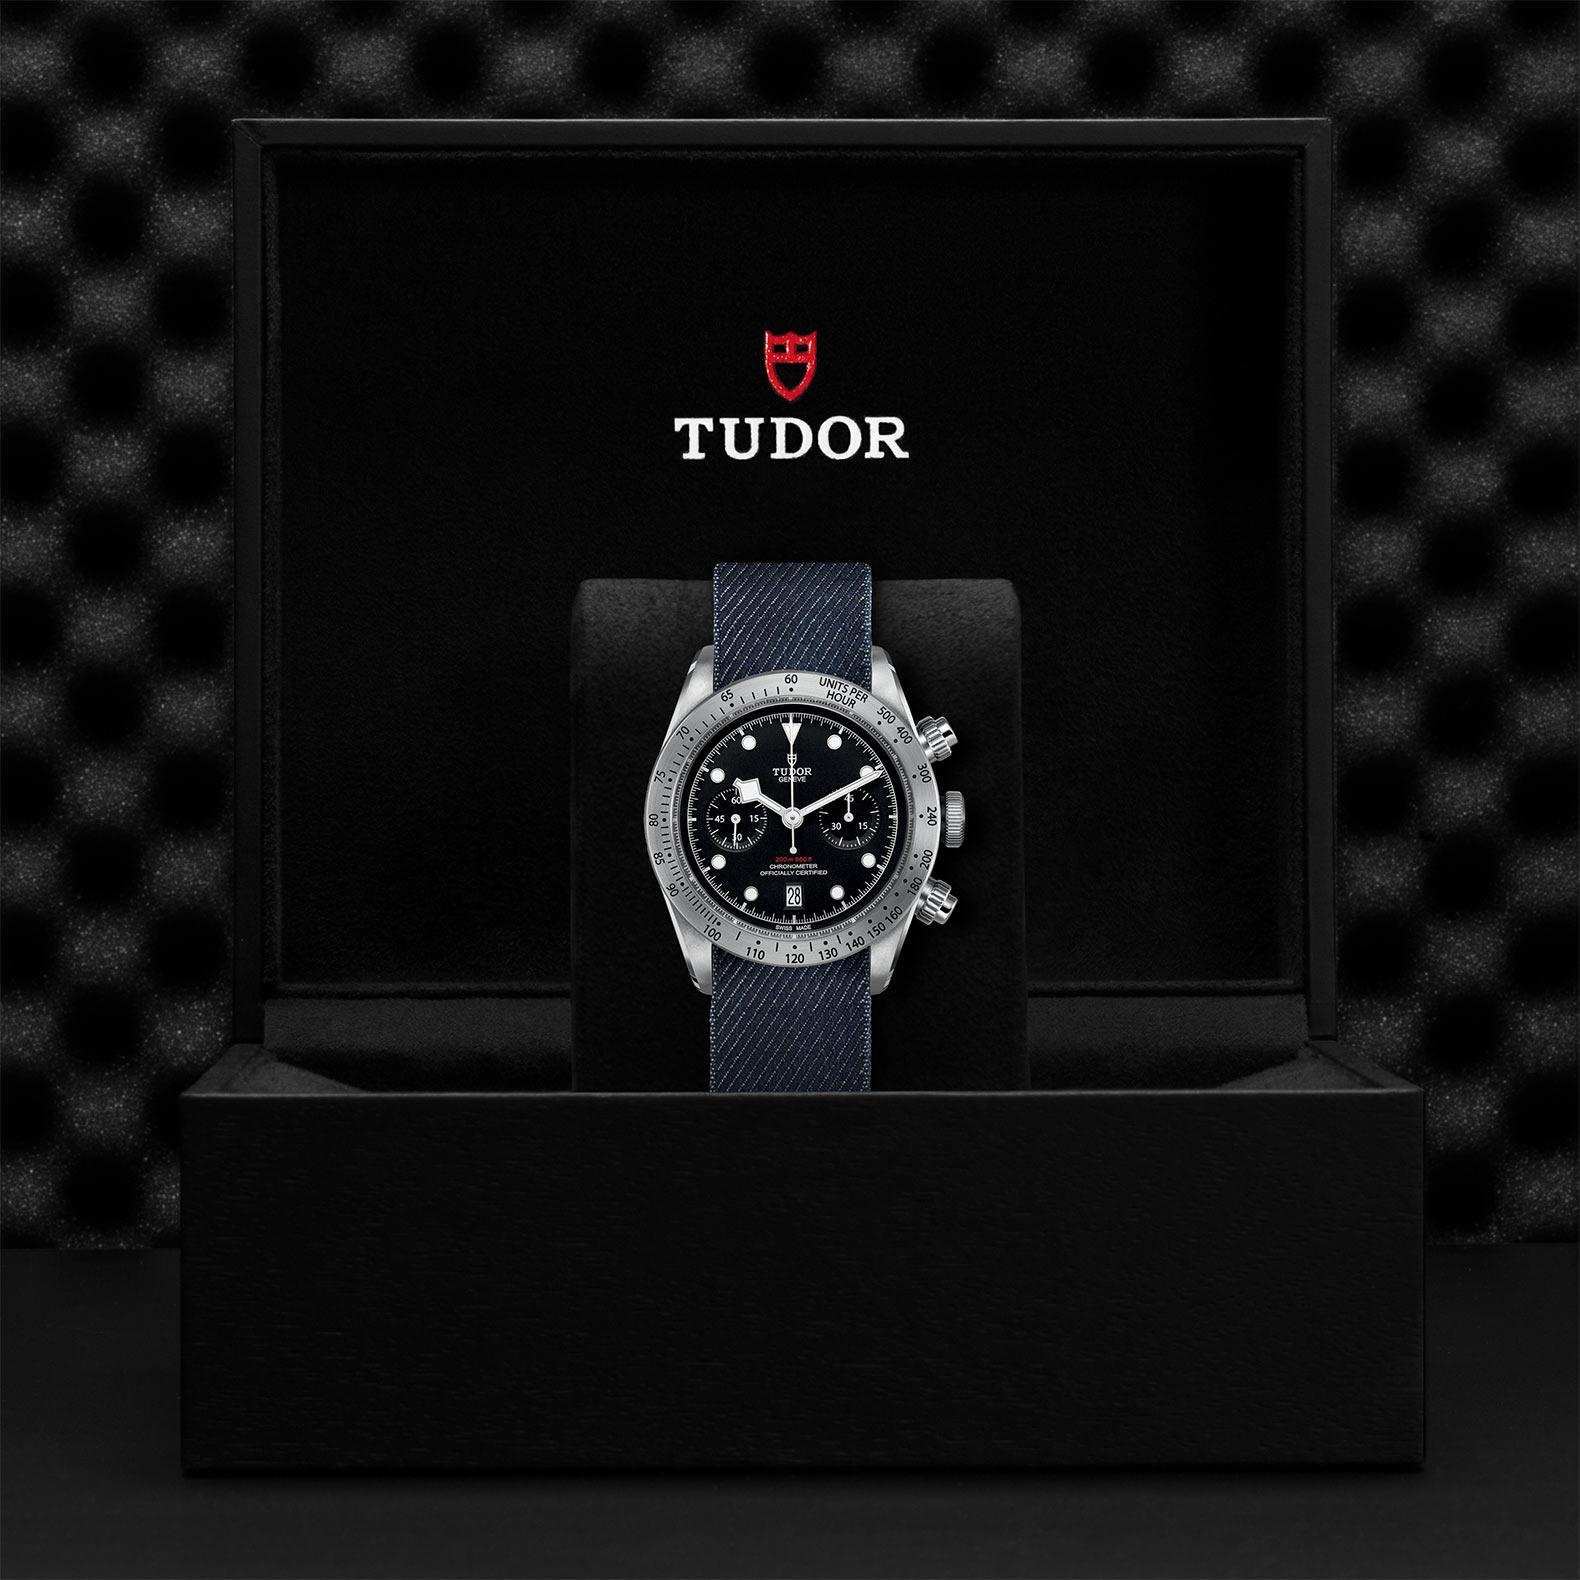 TUDOR Black Bay Chrono M79350 0003 Presentation